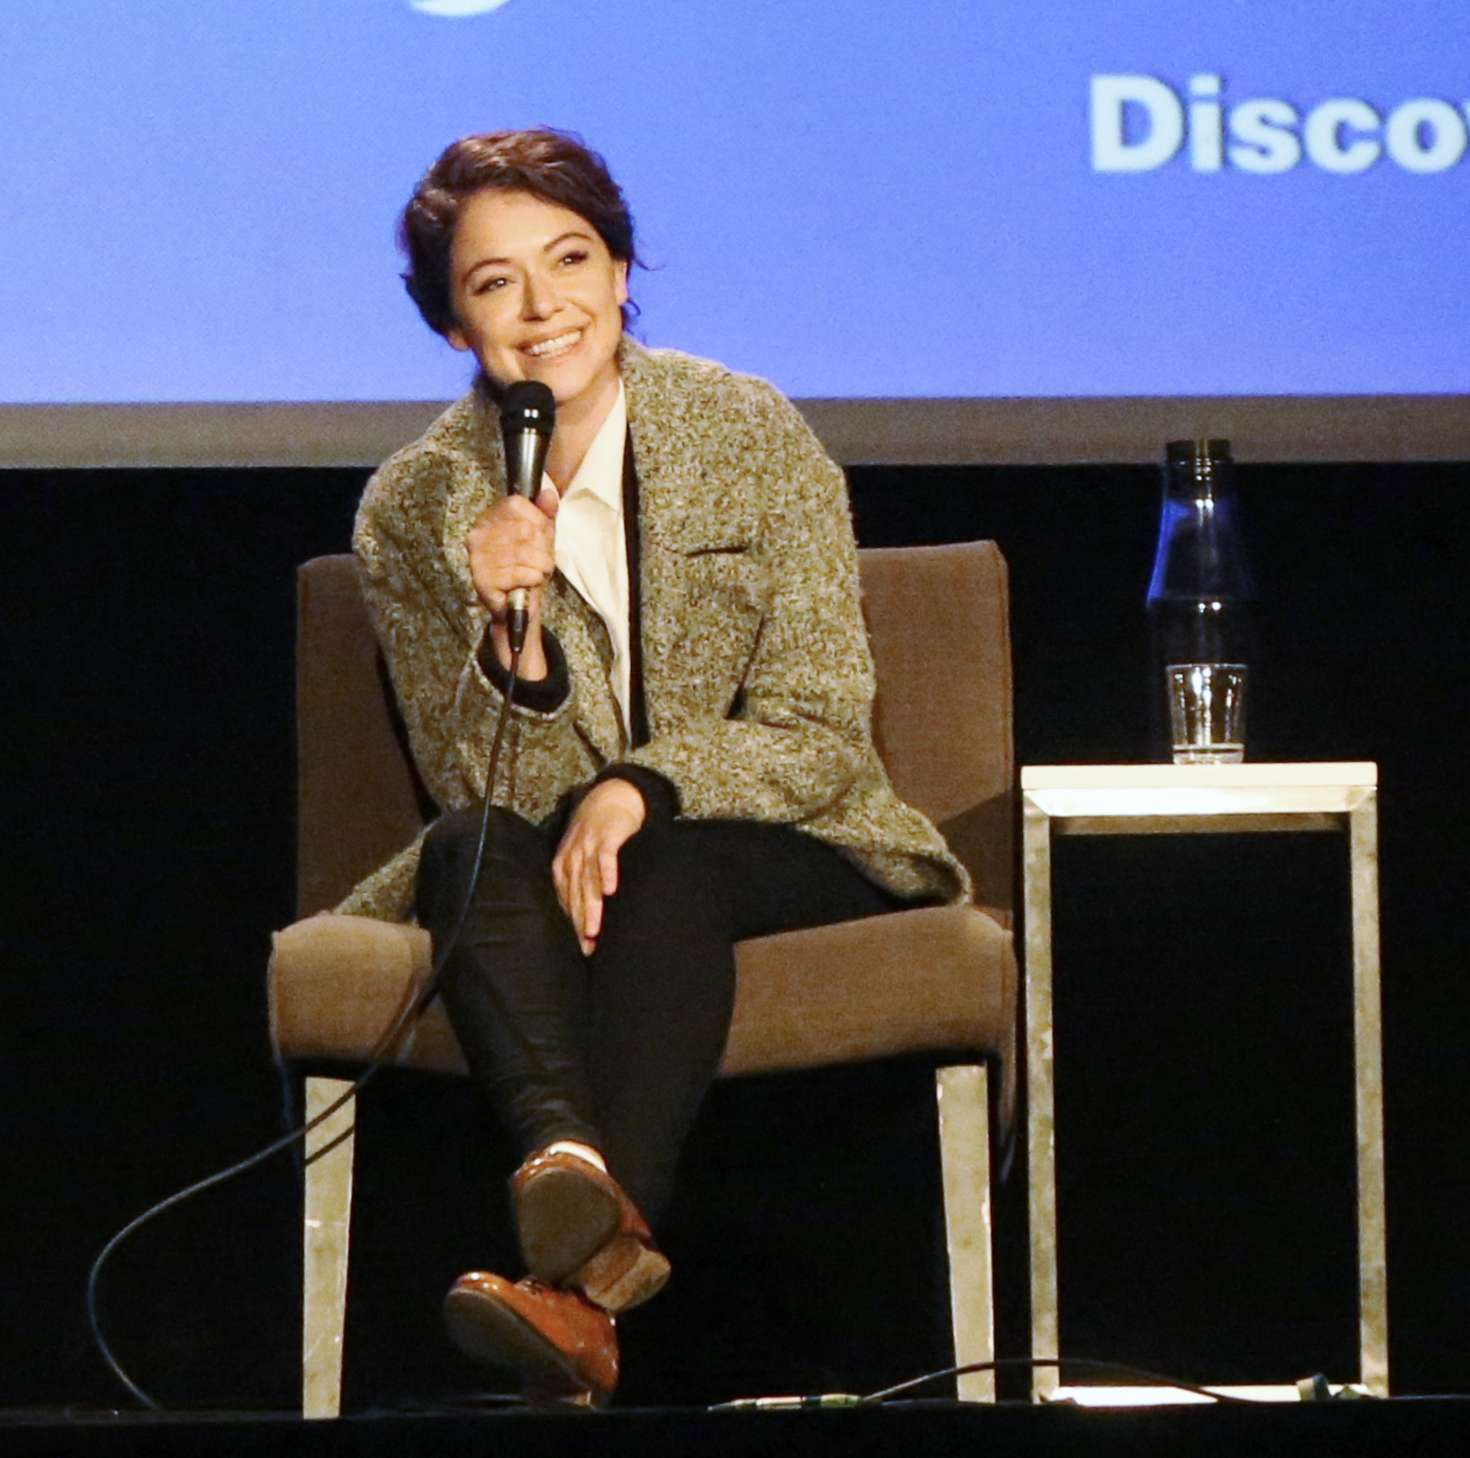 Uncategorized 2016 : Tatiana Maslany: Speaks at the VIFF in Vancouver-06